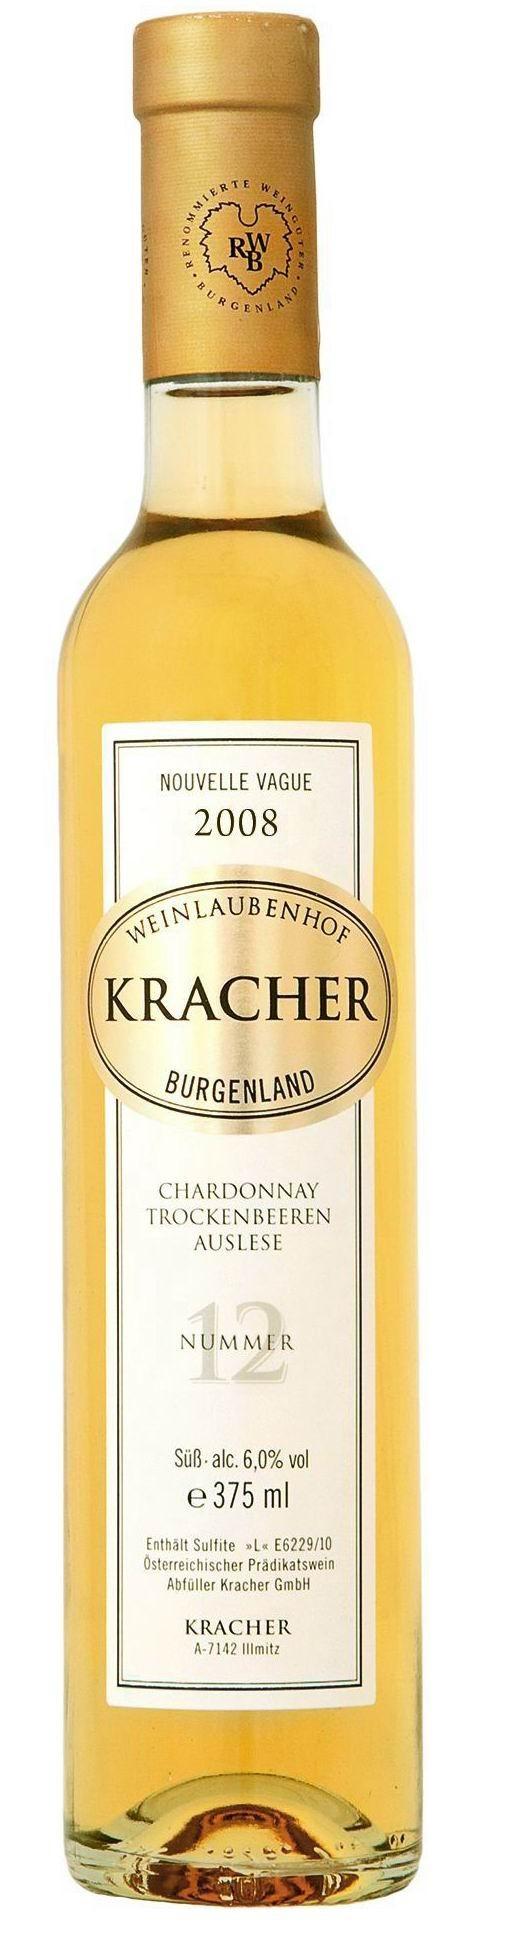 Kracher - Chardonnay Trockenbeerenauslese Nr. 12 Nouvelle Vague, 2008